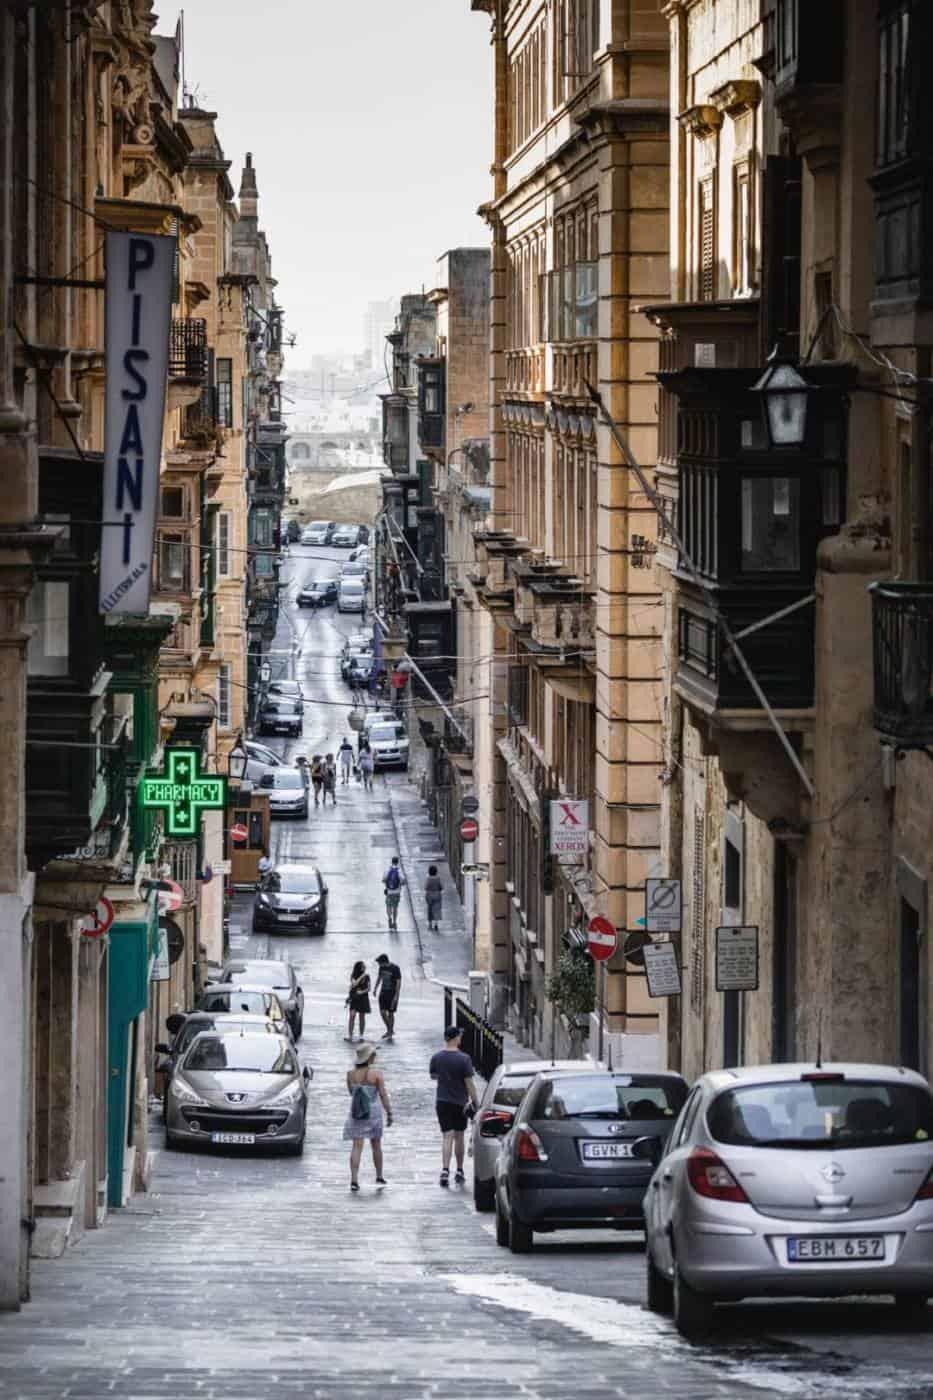 Streets of Valletta Malta